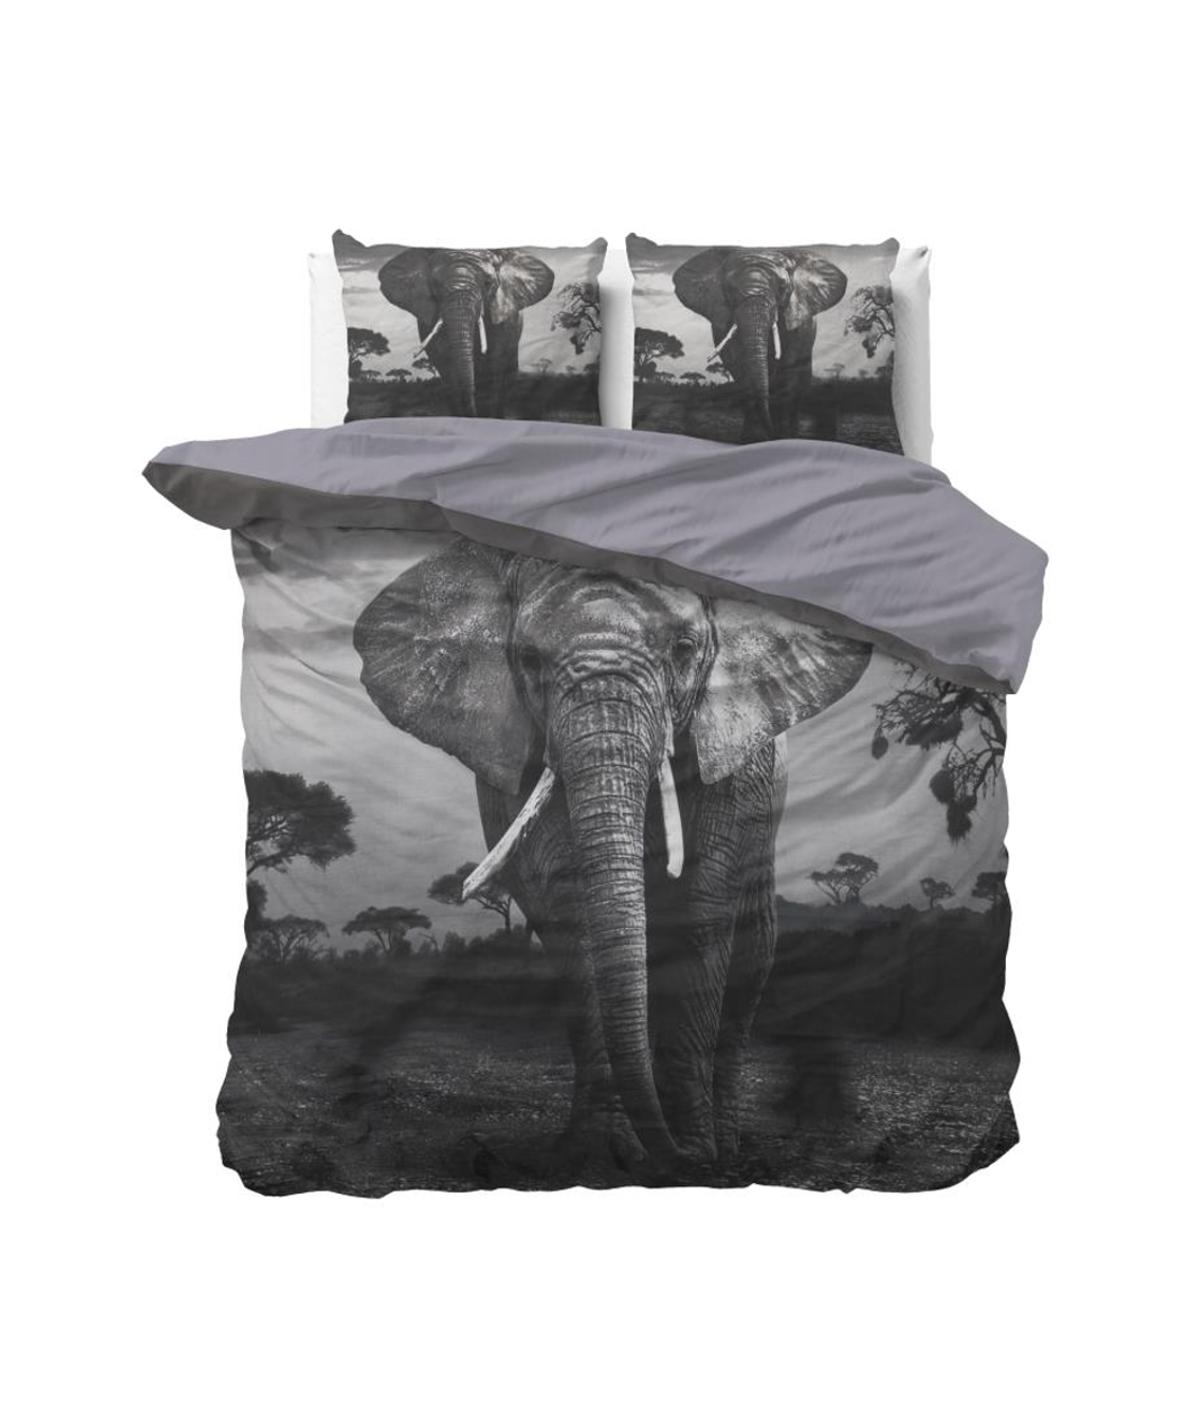 Elephant Mansion Anthracite